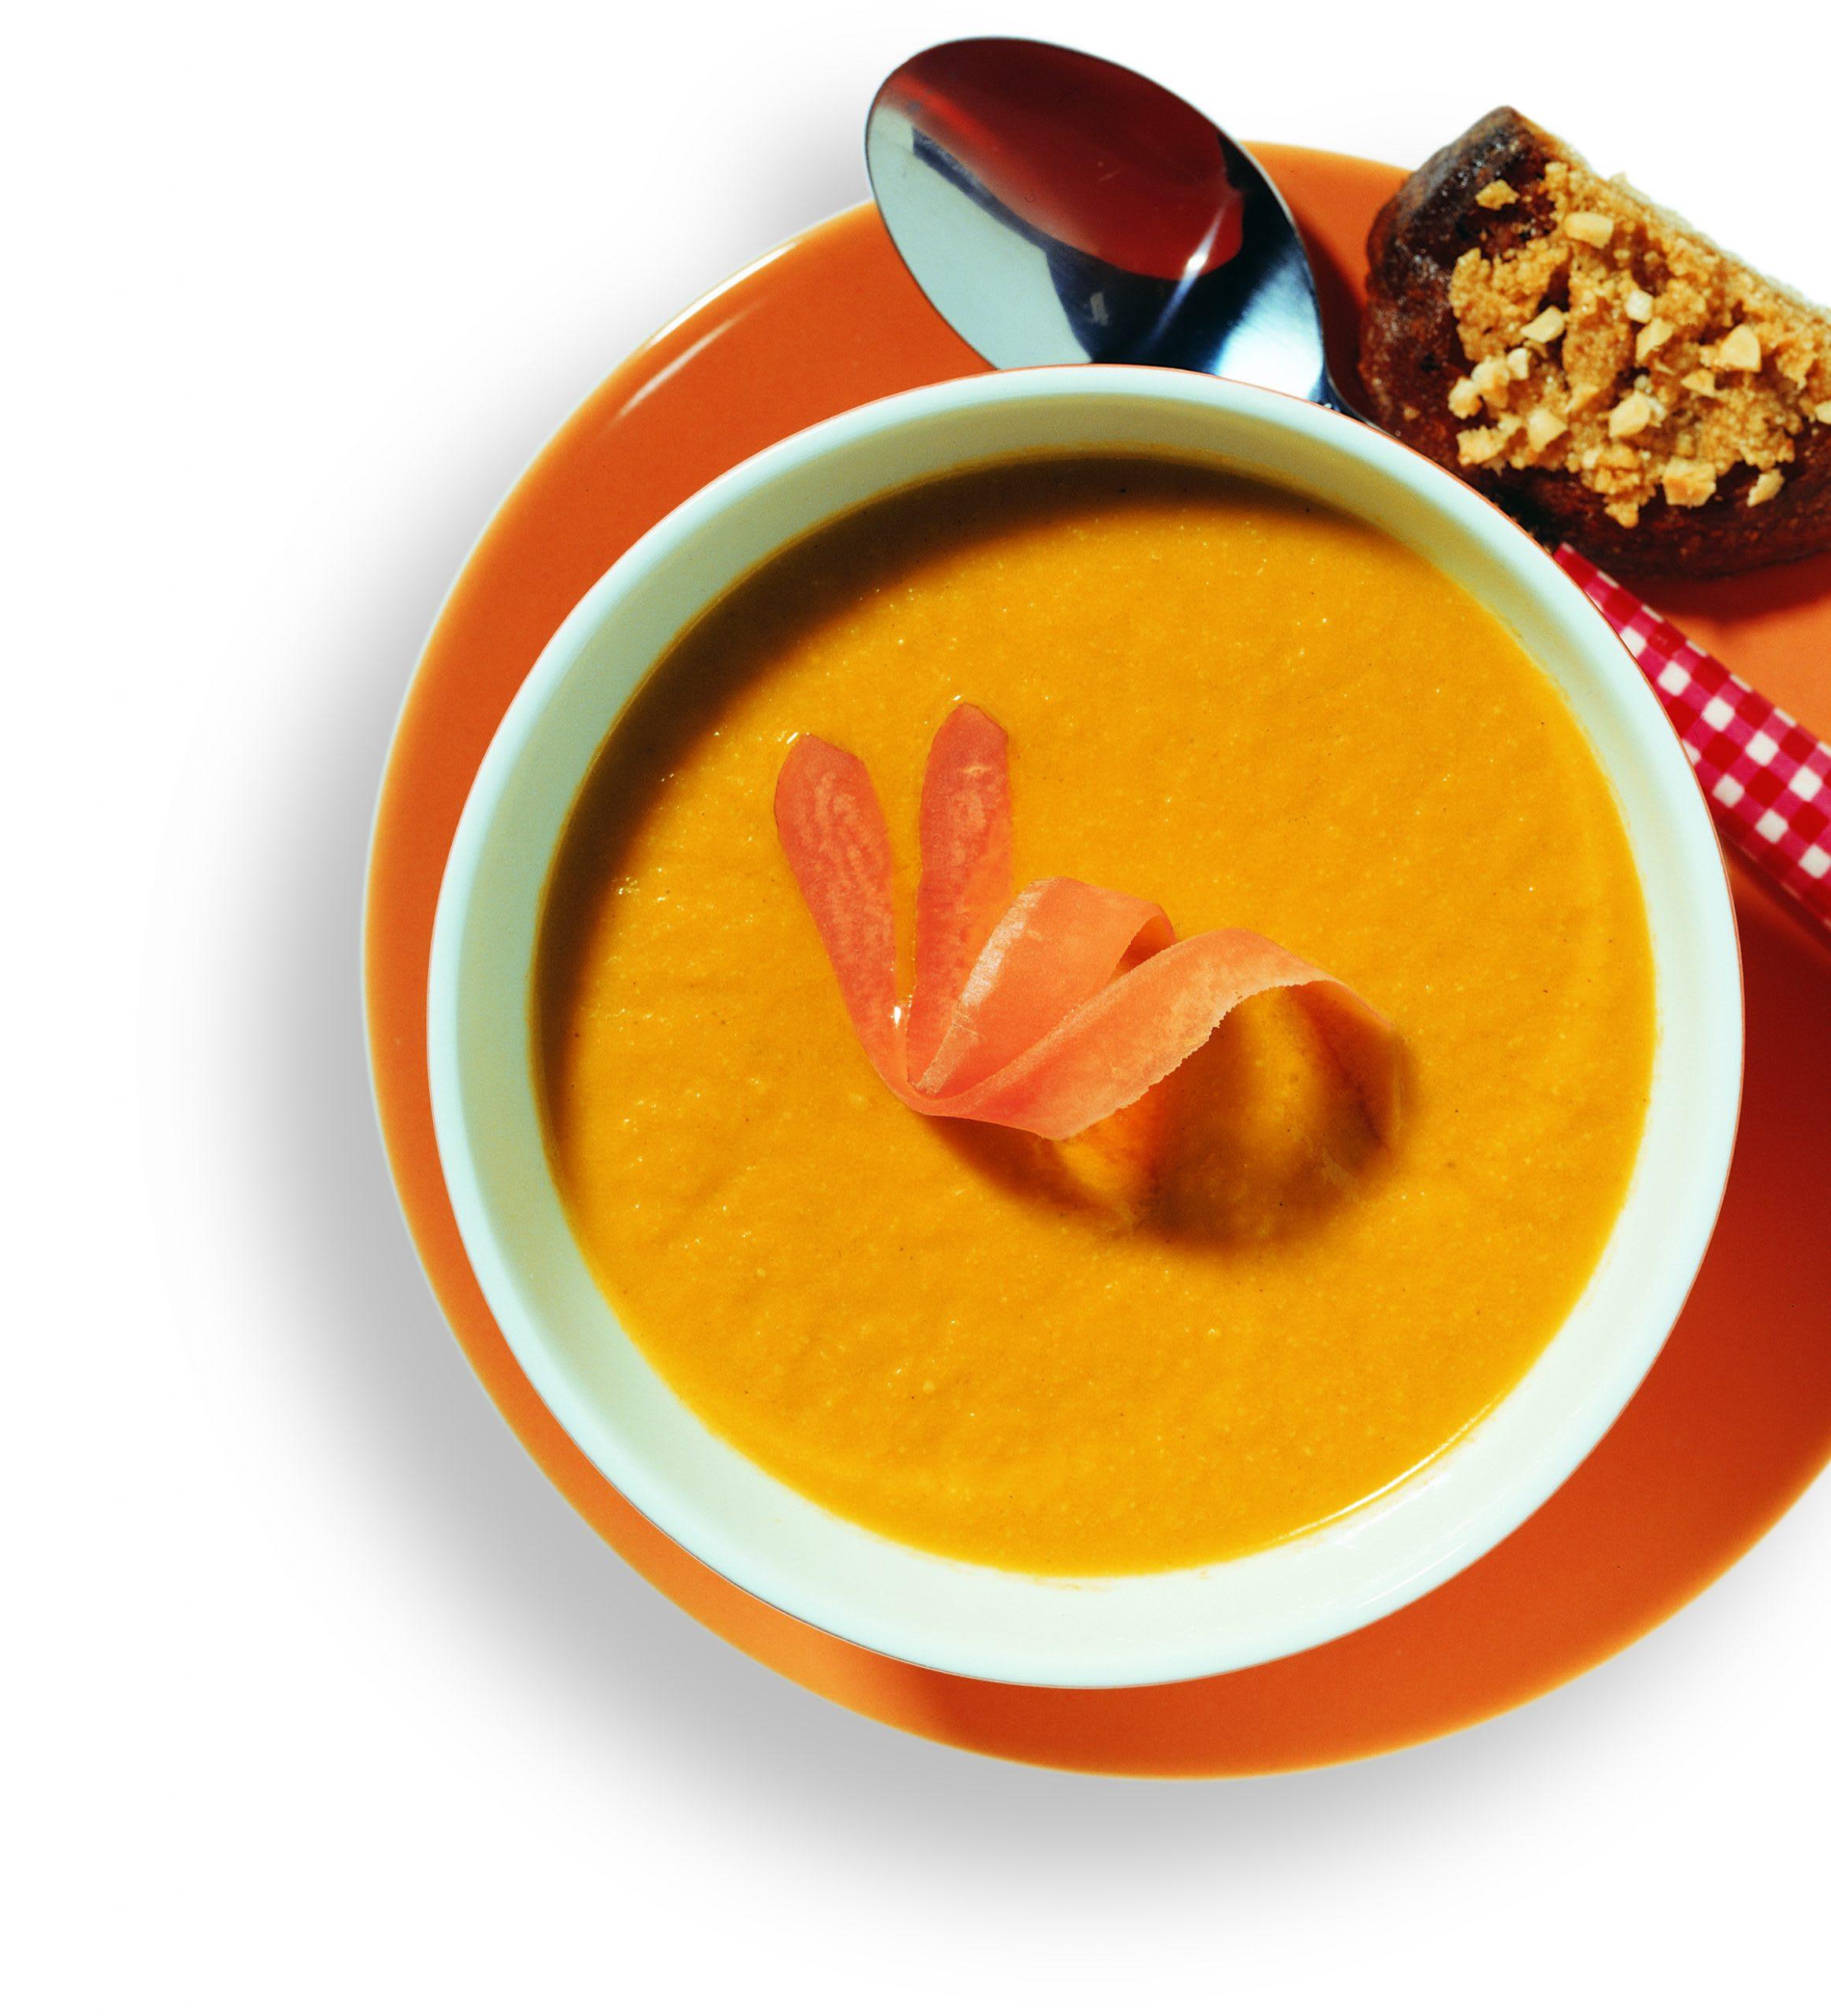 Rüebli-Haselnuss-Suppe